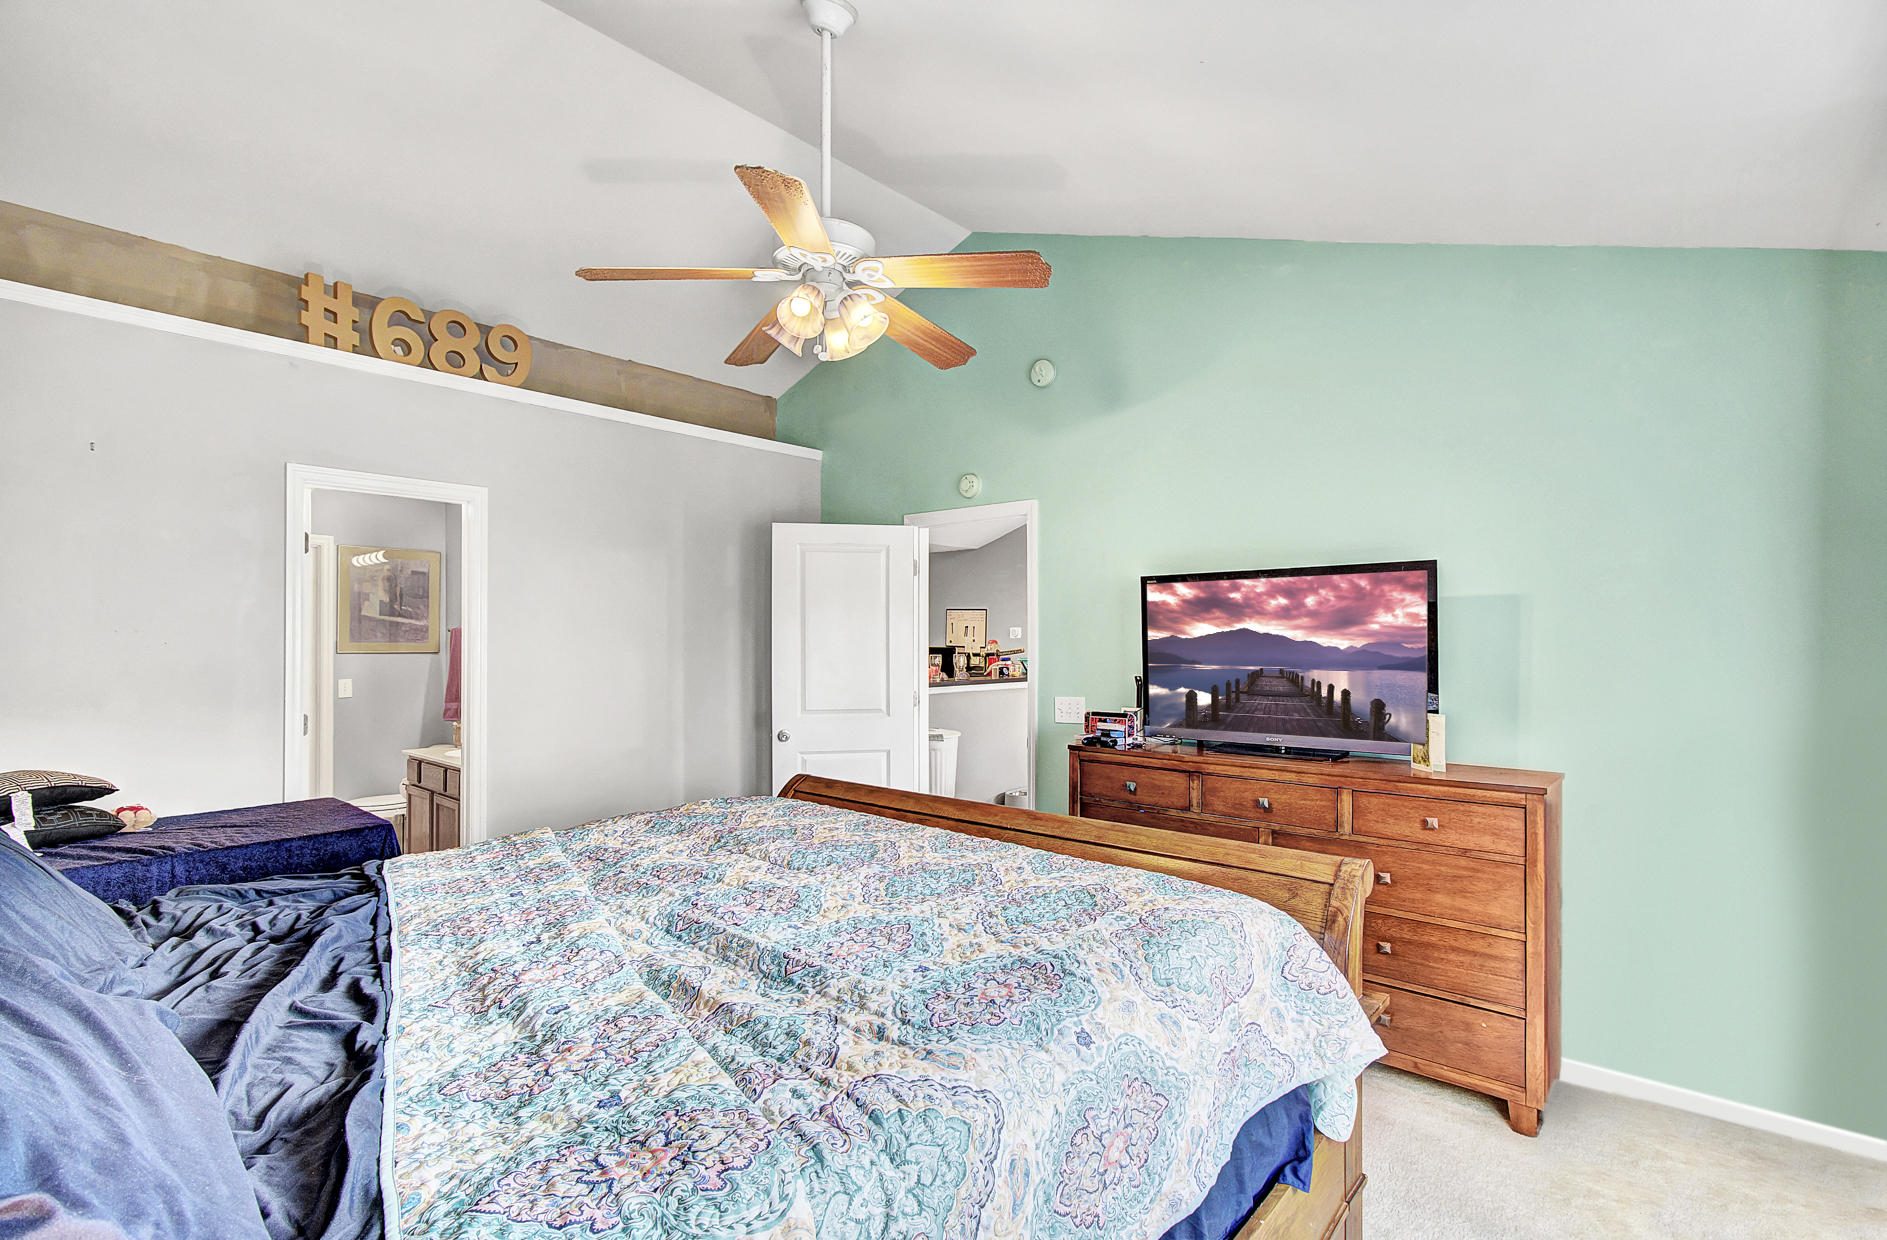 Oakley Pointe Homes For Sale - 231 Silk Oak, Moncks Corner, SC - 15